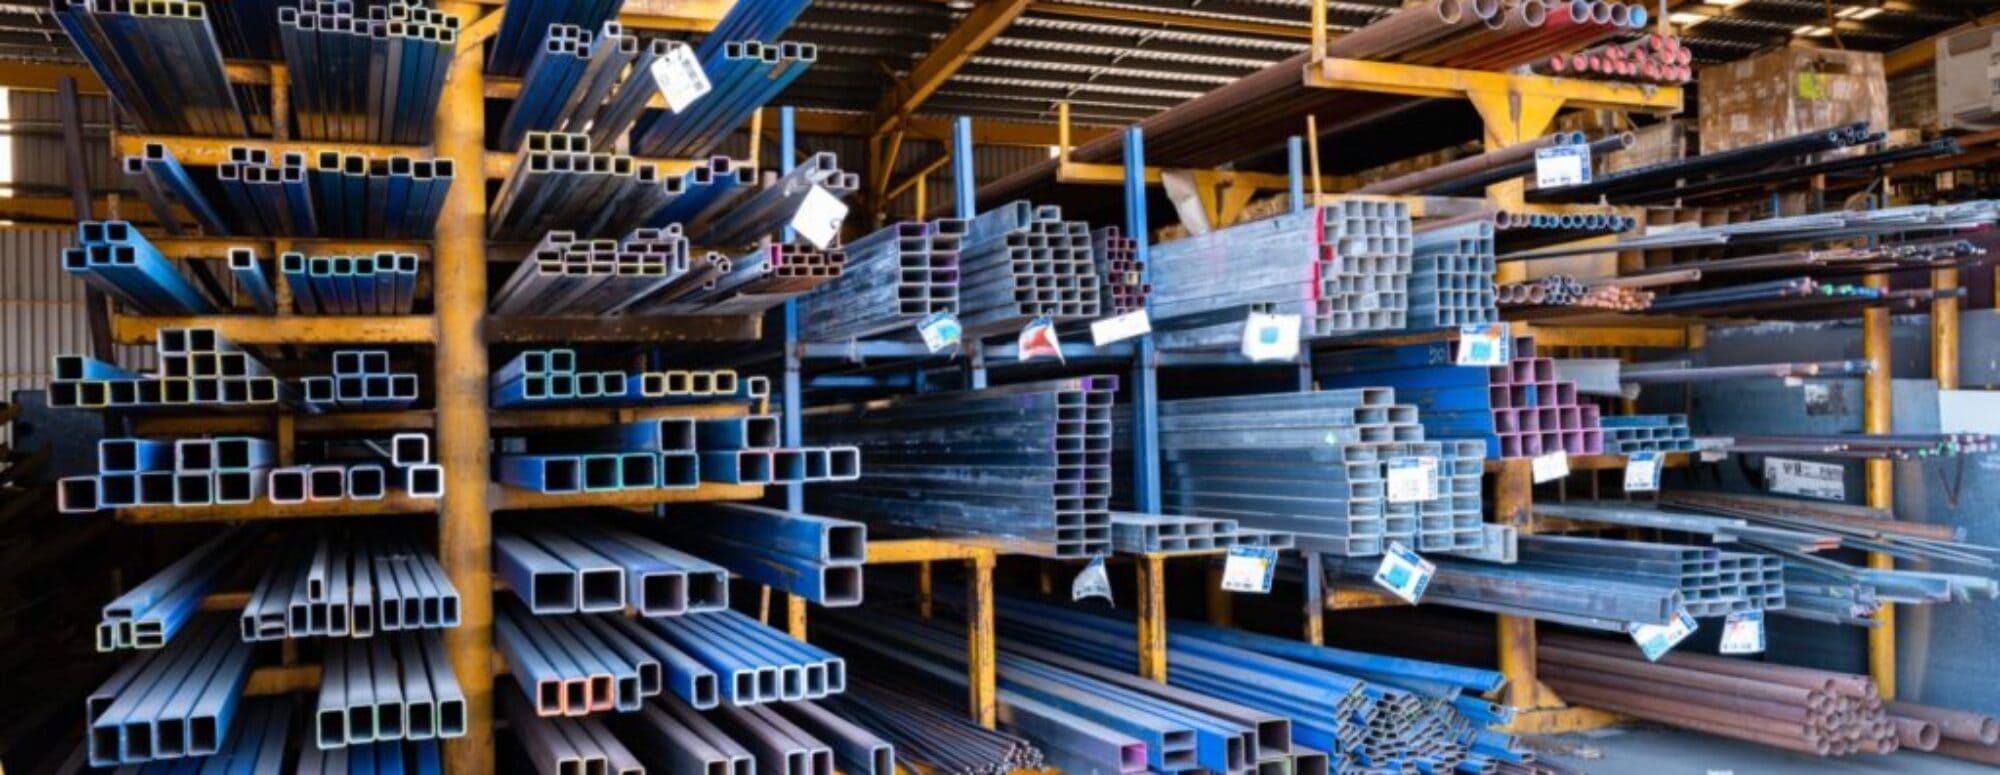 Steel Supplies